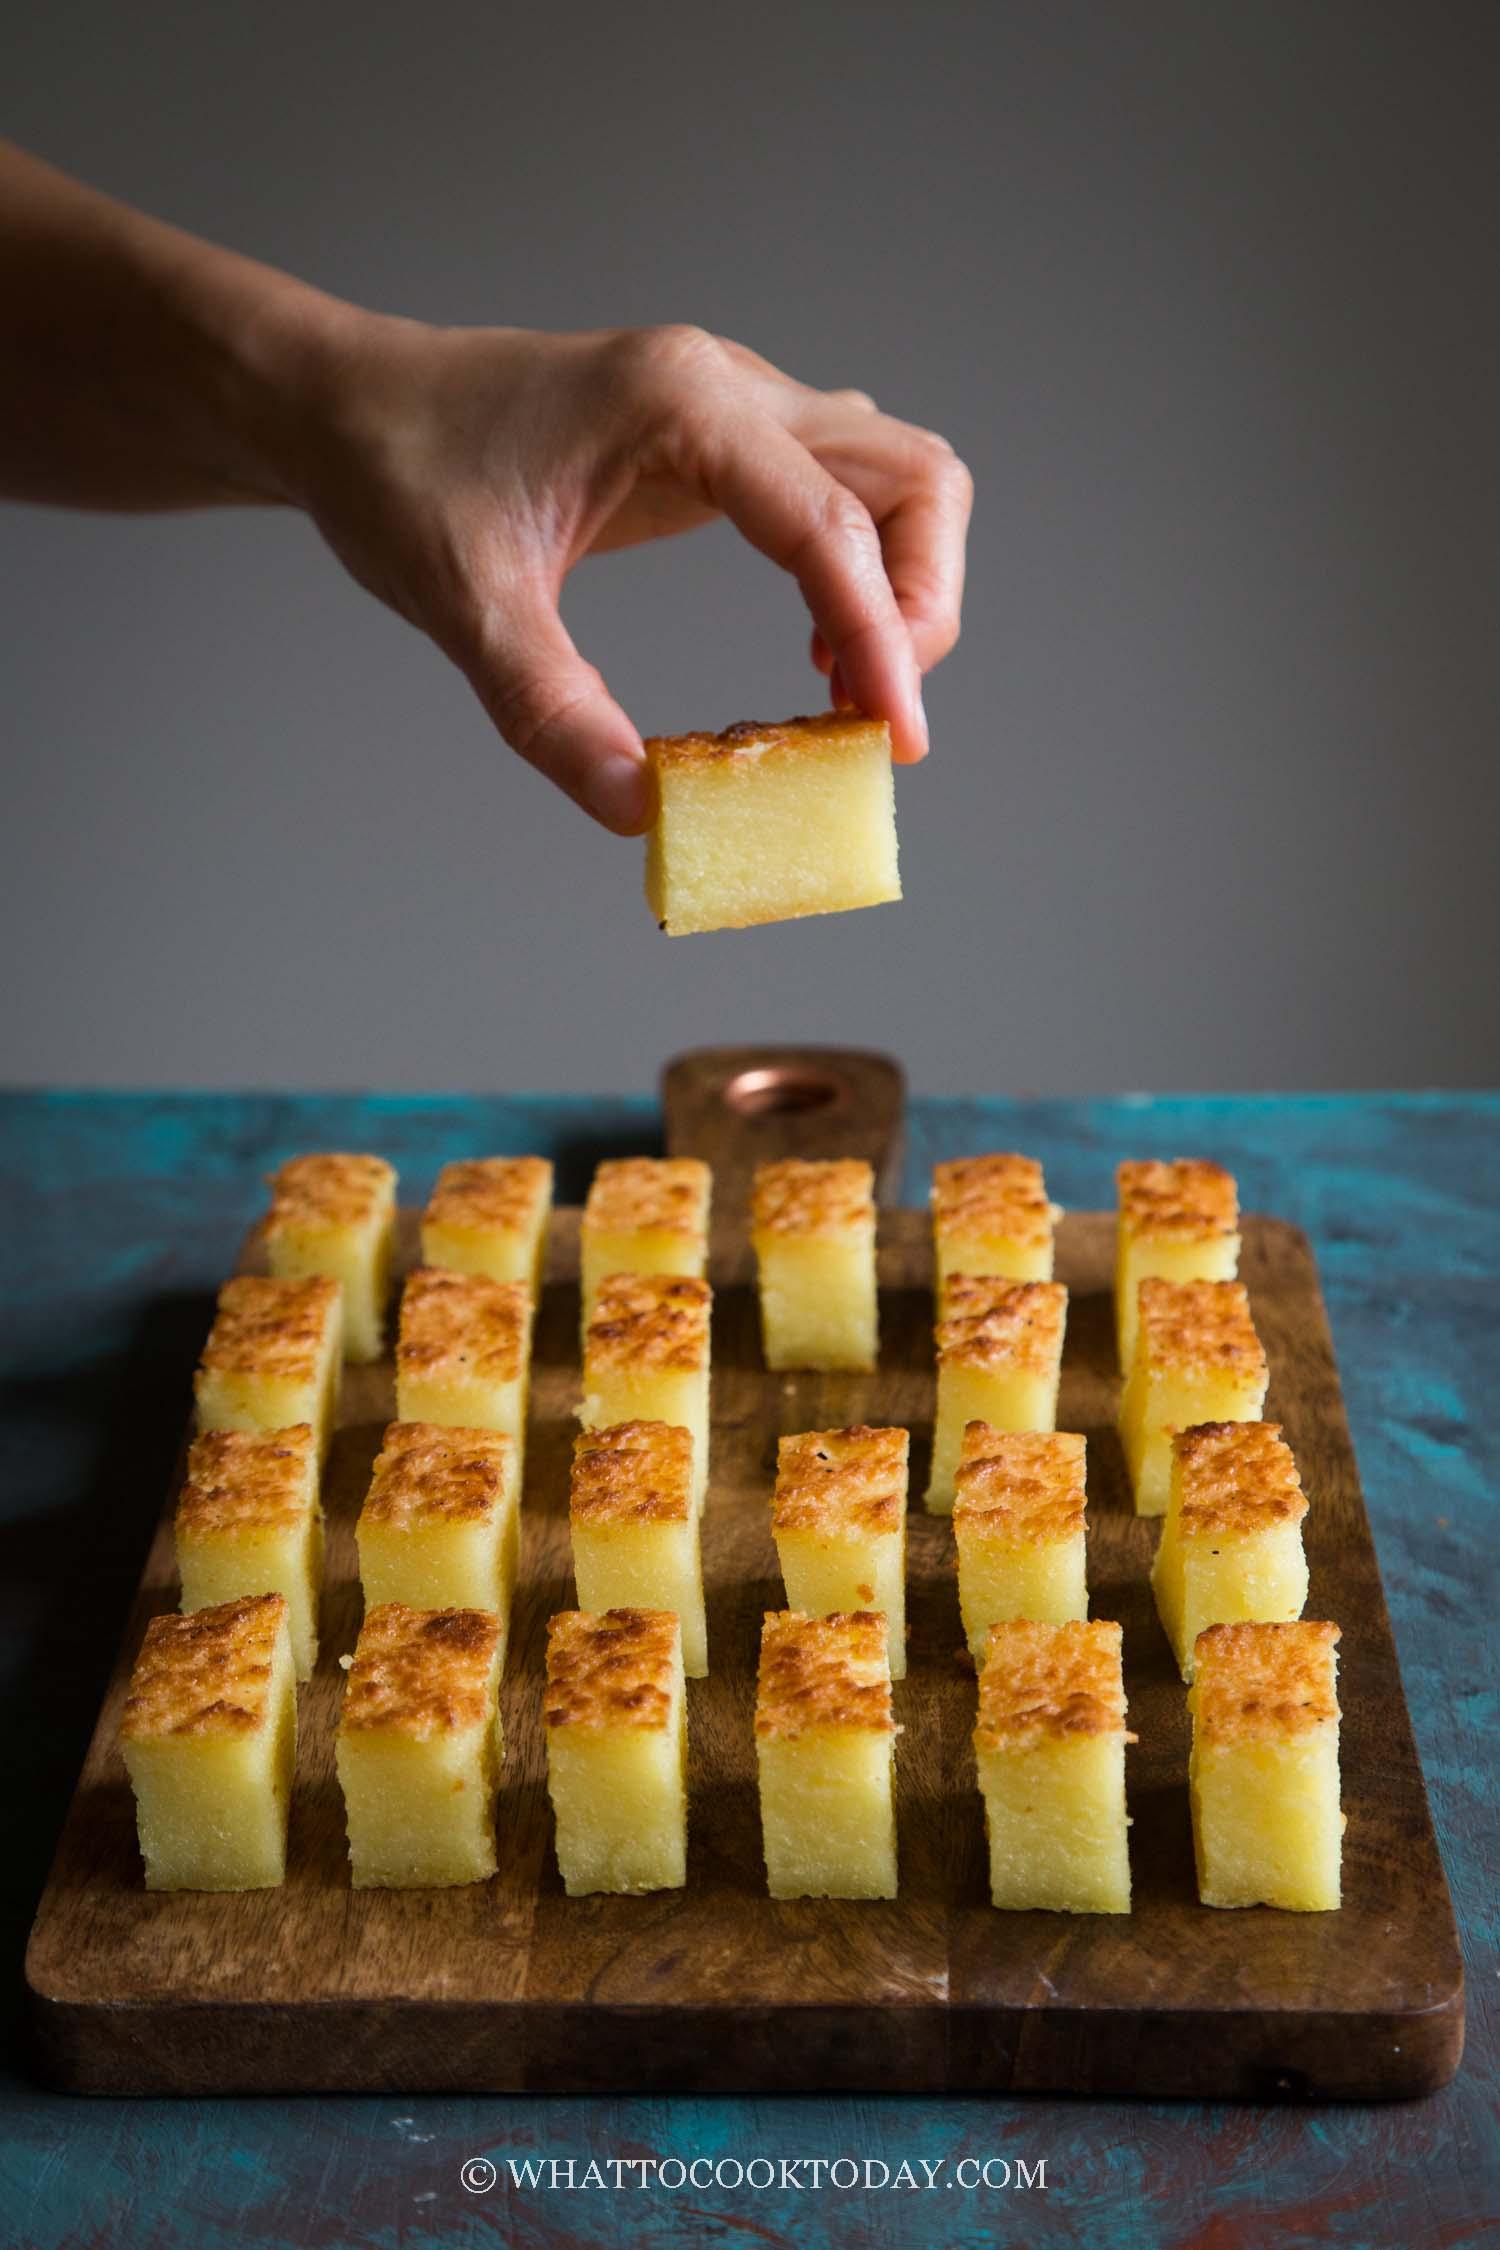 Bingka Ubi Kayu (Baked Cassava Cake)